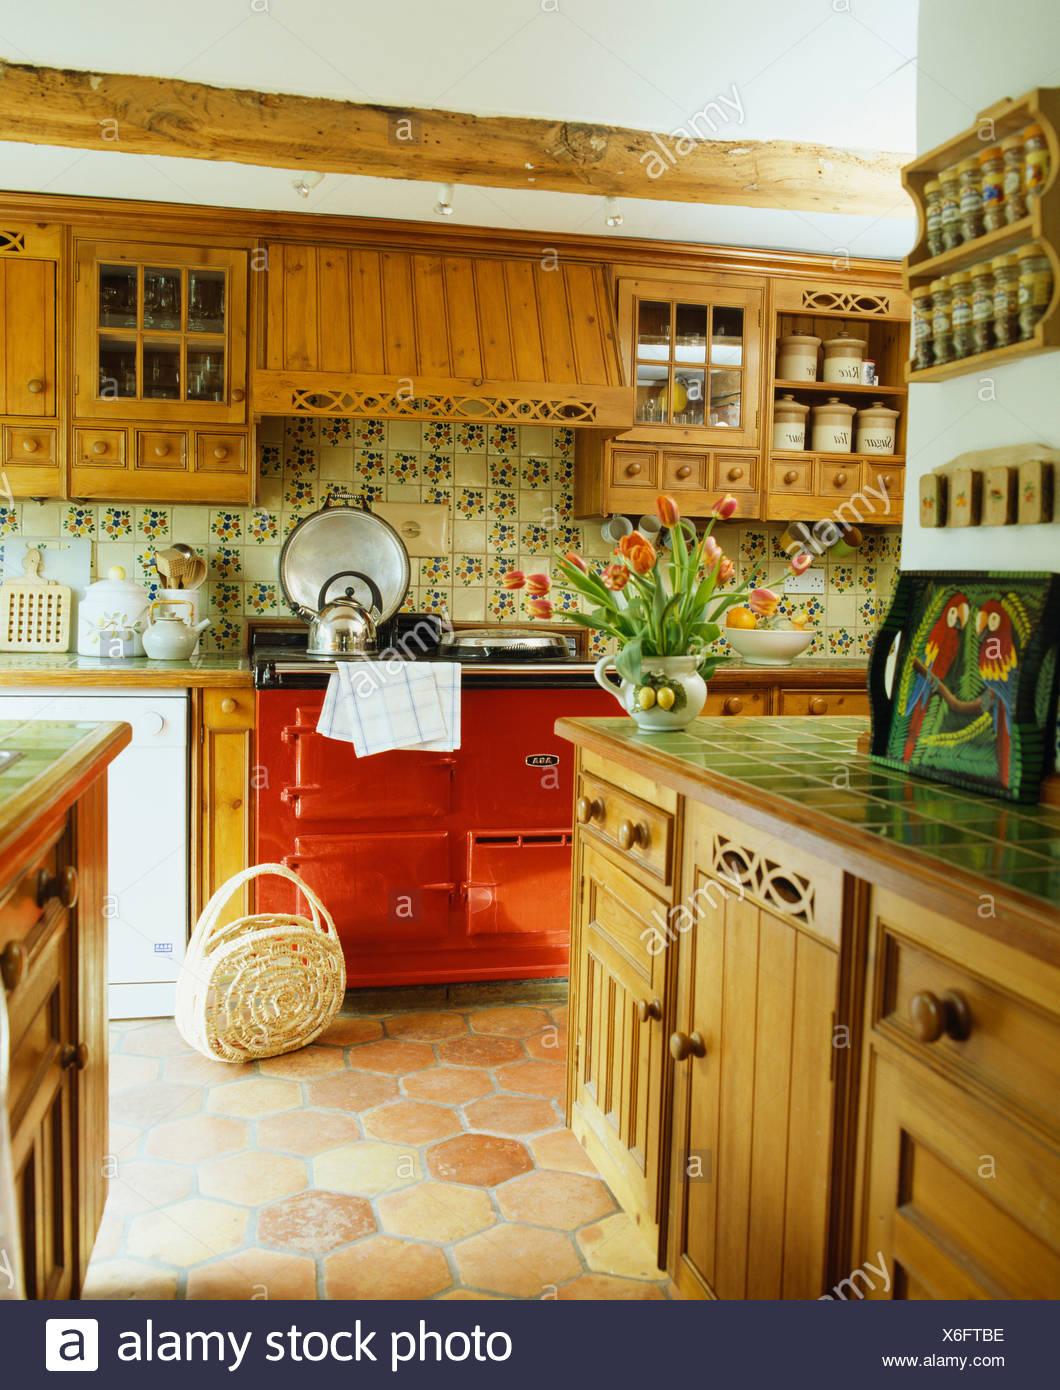 Red Terracotta Floor Stockfotos Red Terracotta Floor